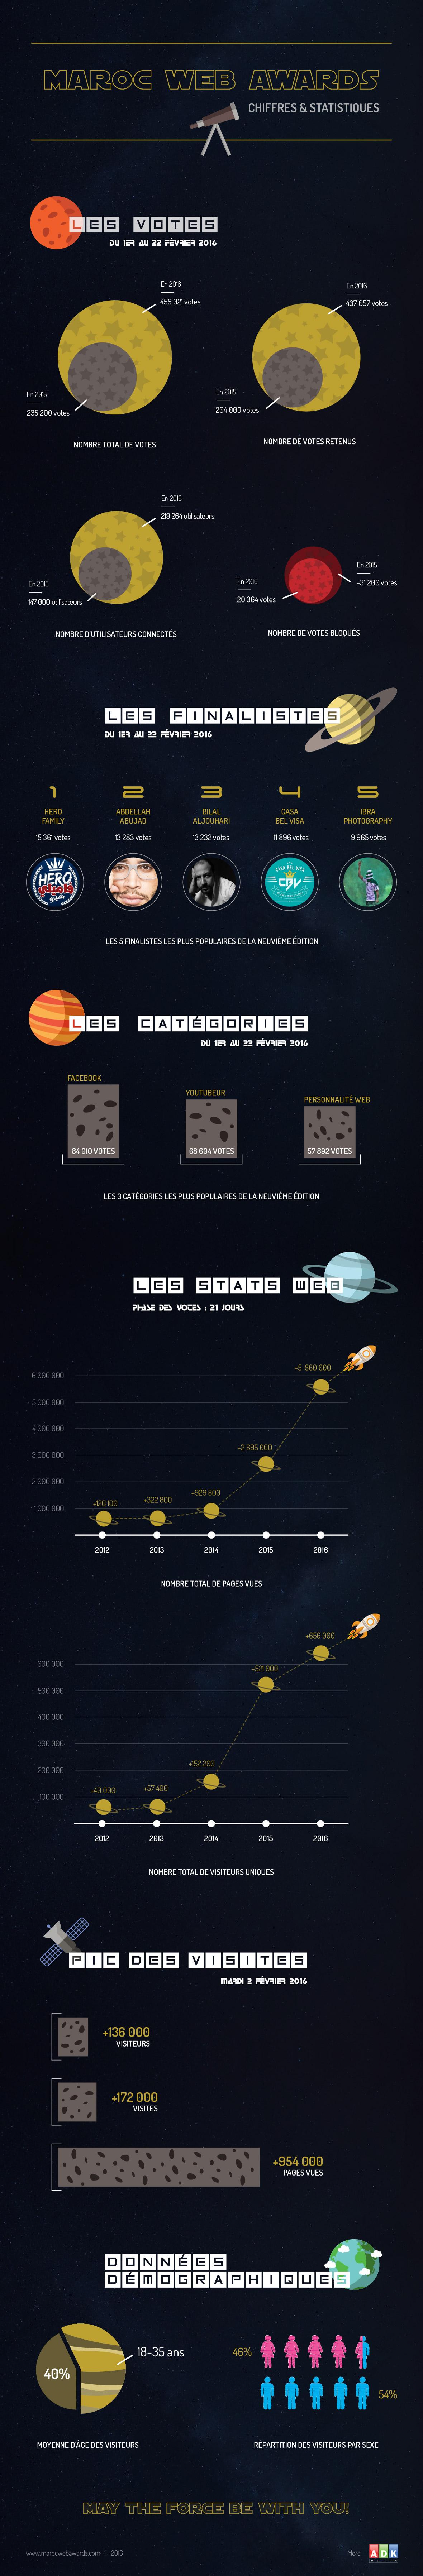 Statistiques Infographie MWA9